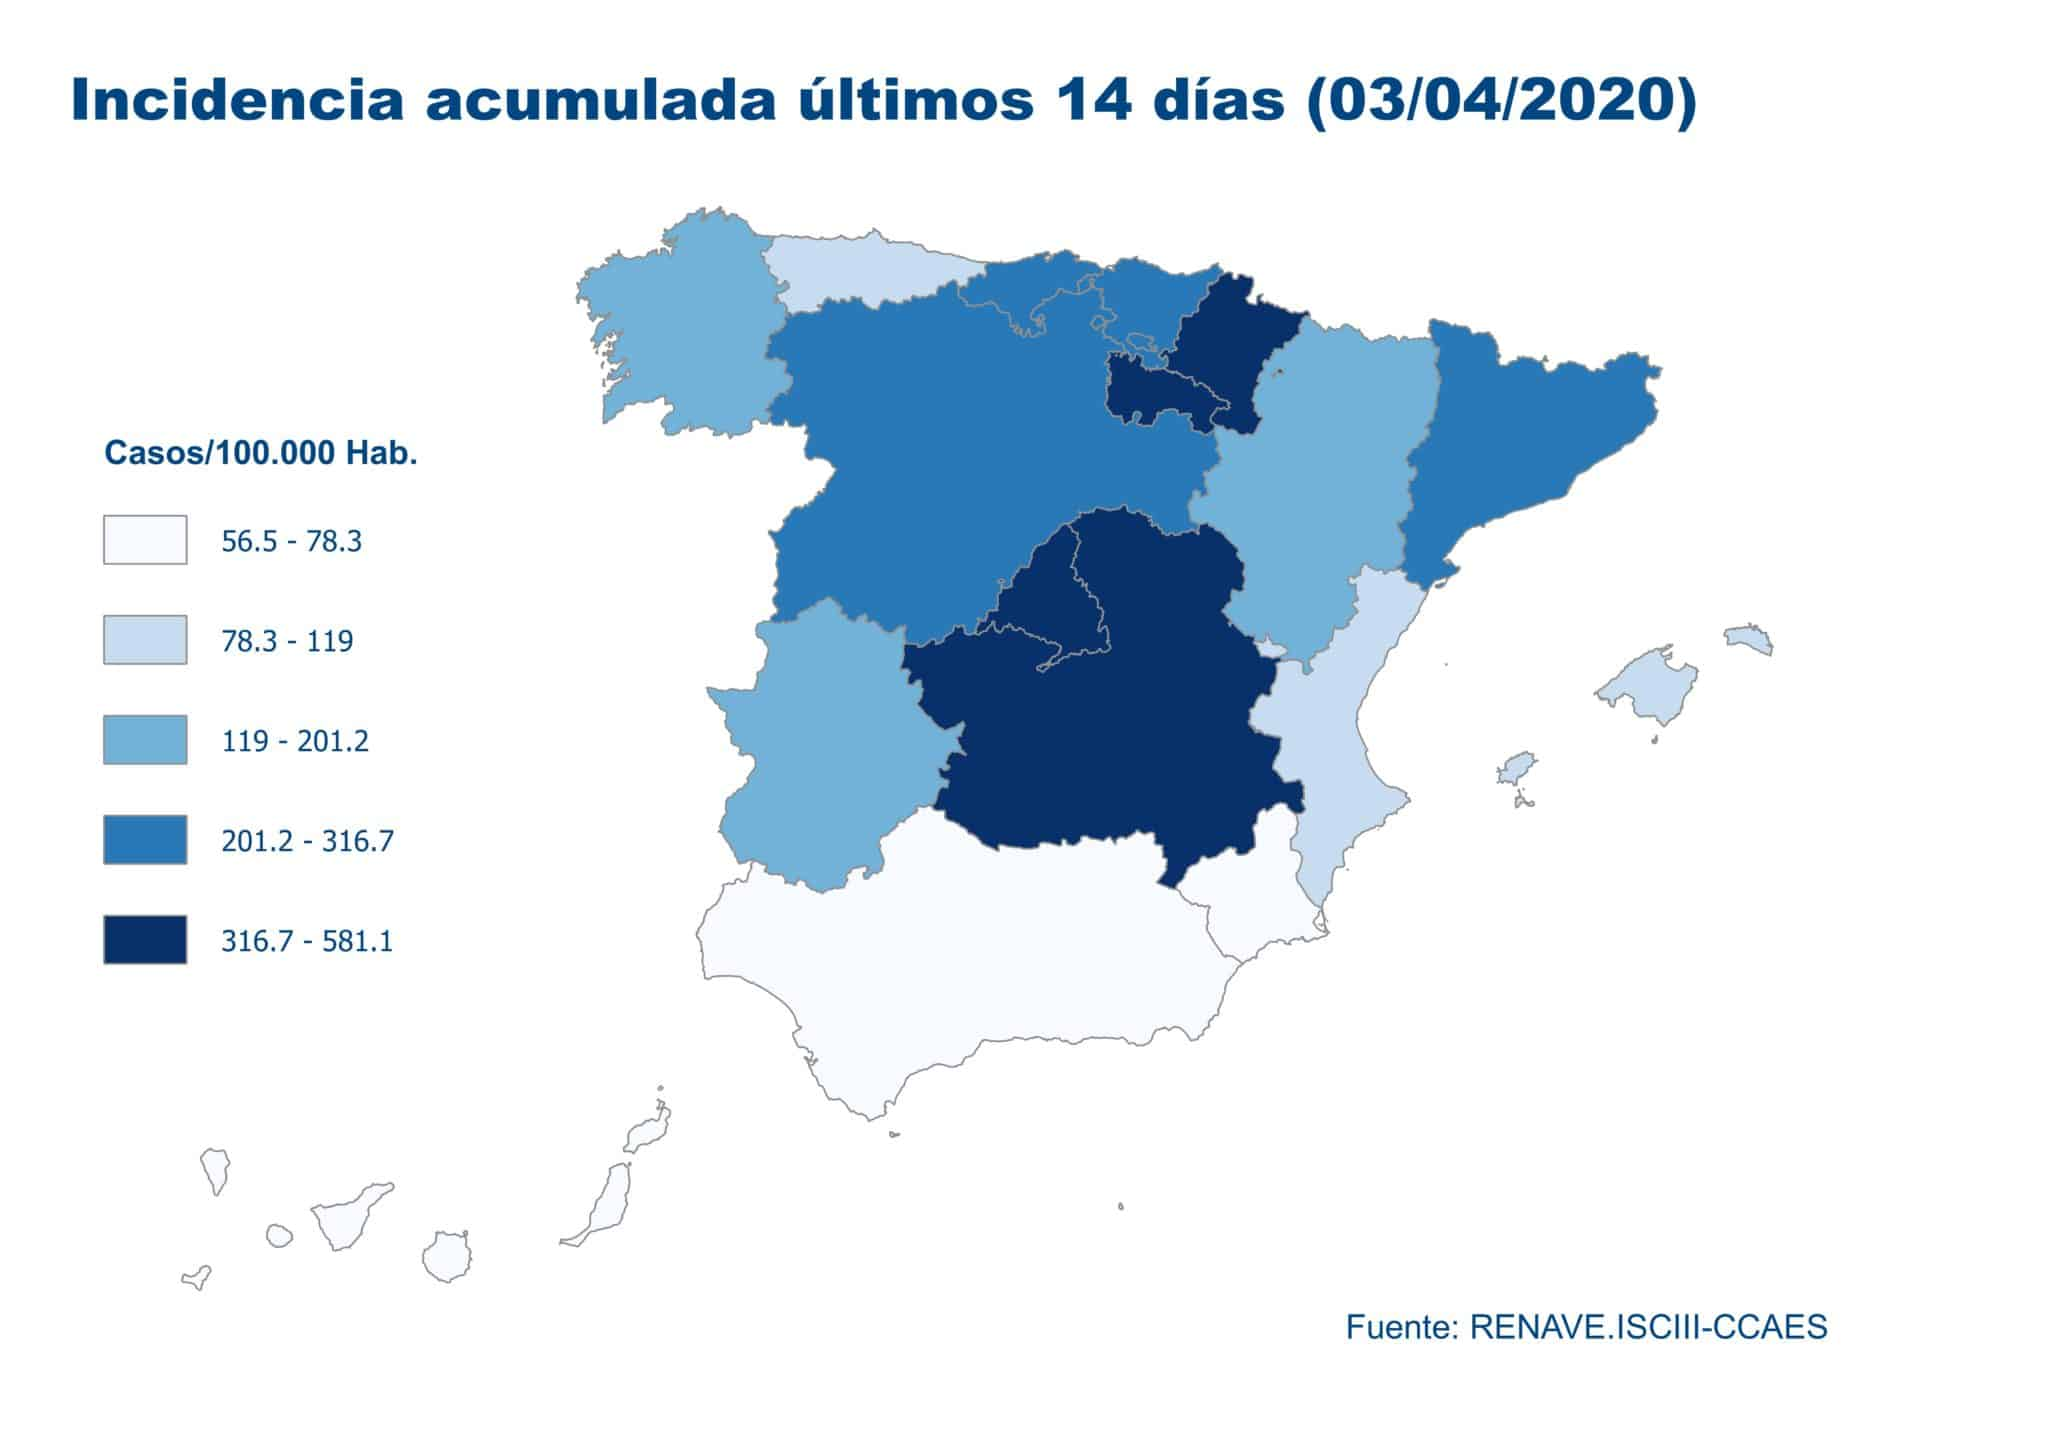 La cifra de fallecidos en La Rioja por coronavirus se eleva a 128 personas 3